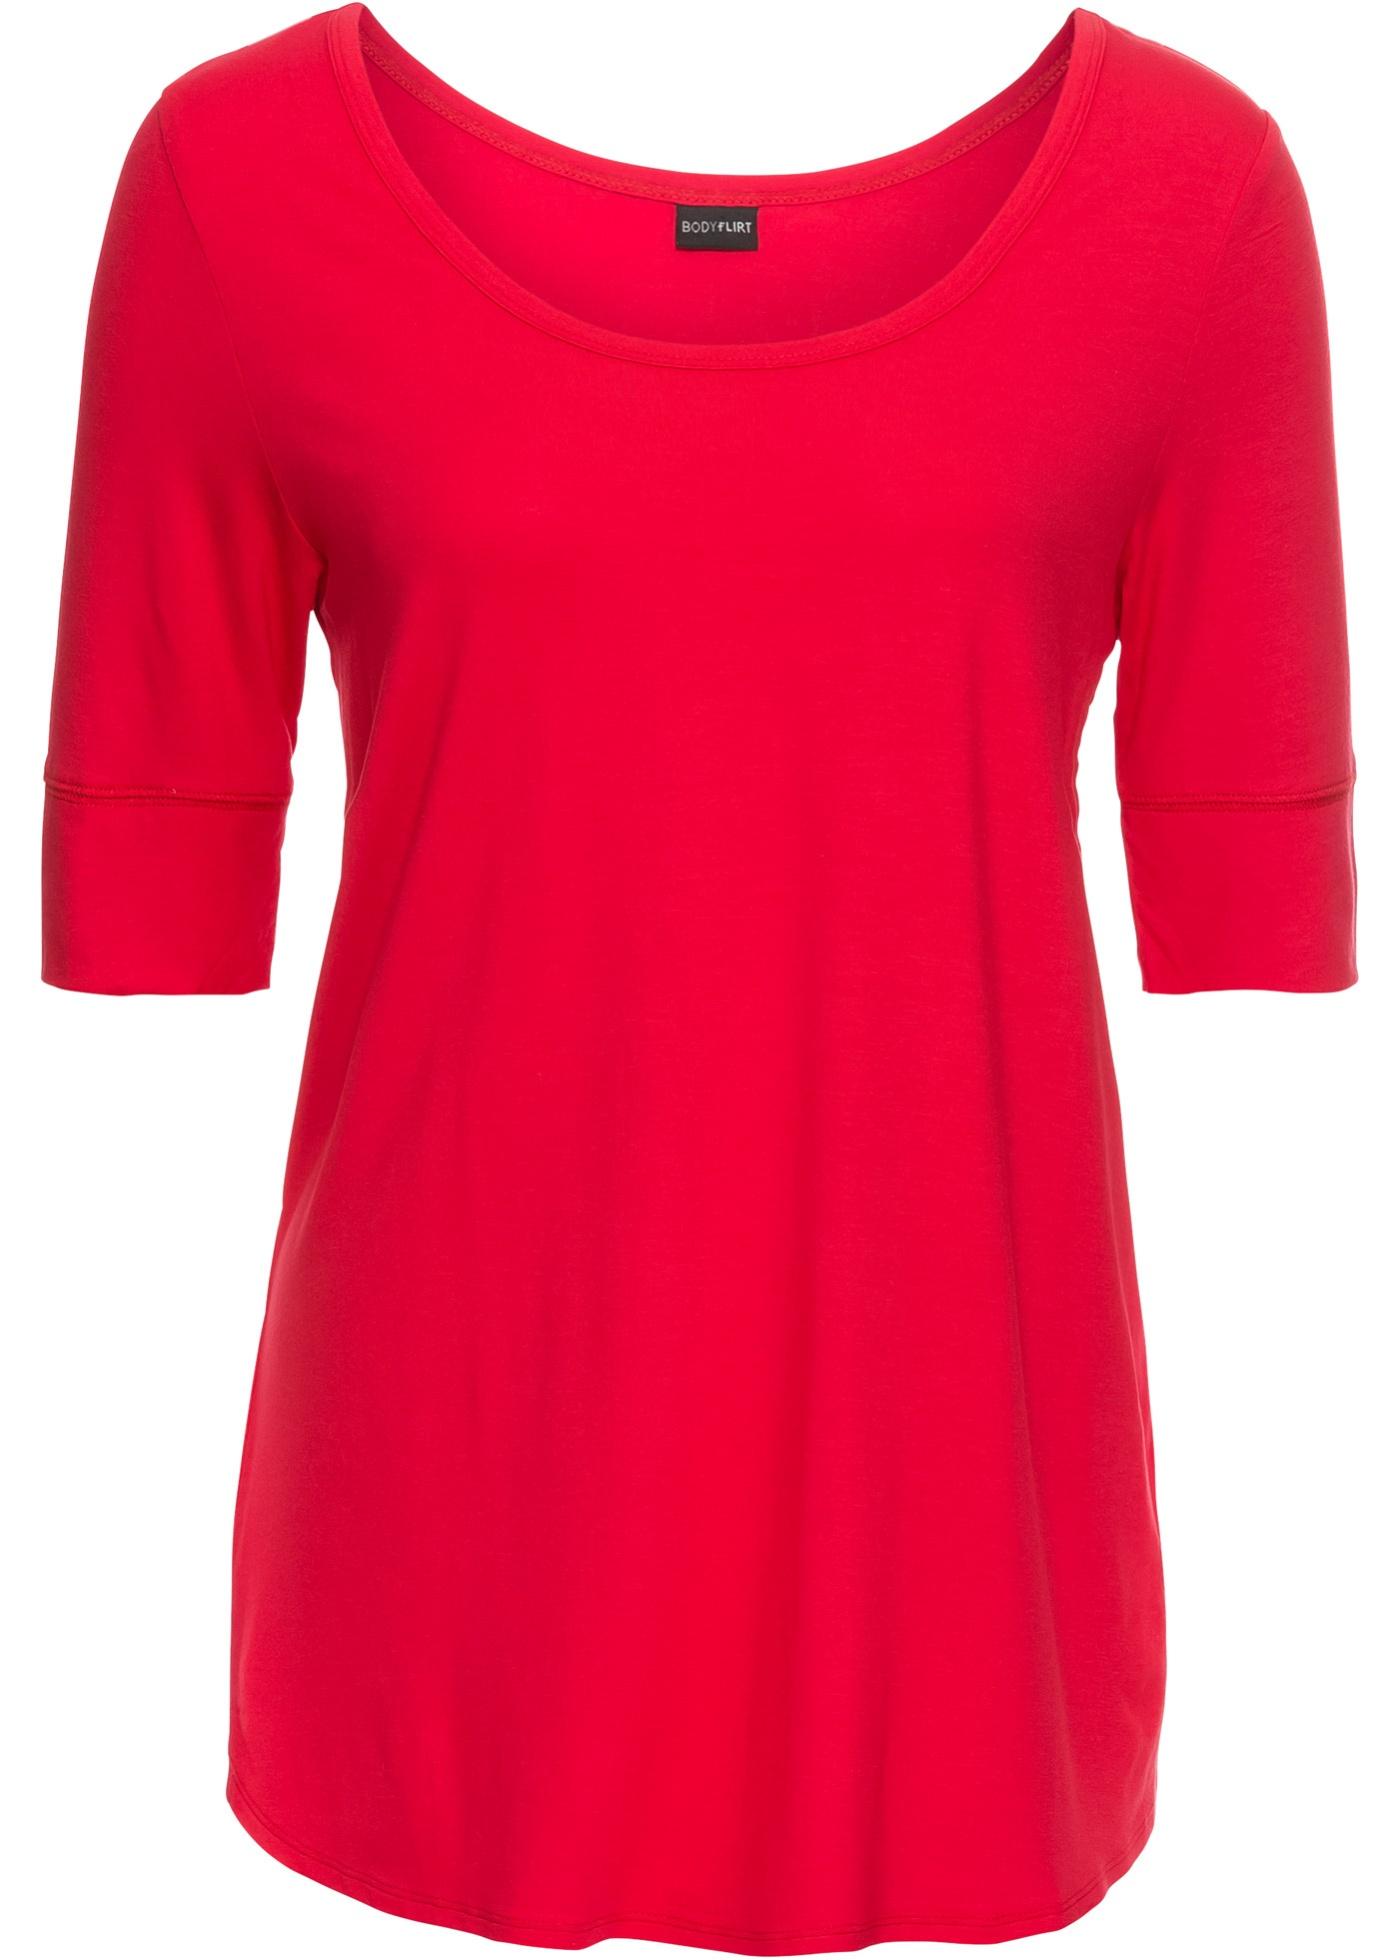 Rouge Manches 3 Pour 4 Bodyflirt shirt BonprixT Femme OPXikZu